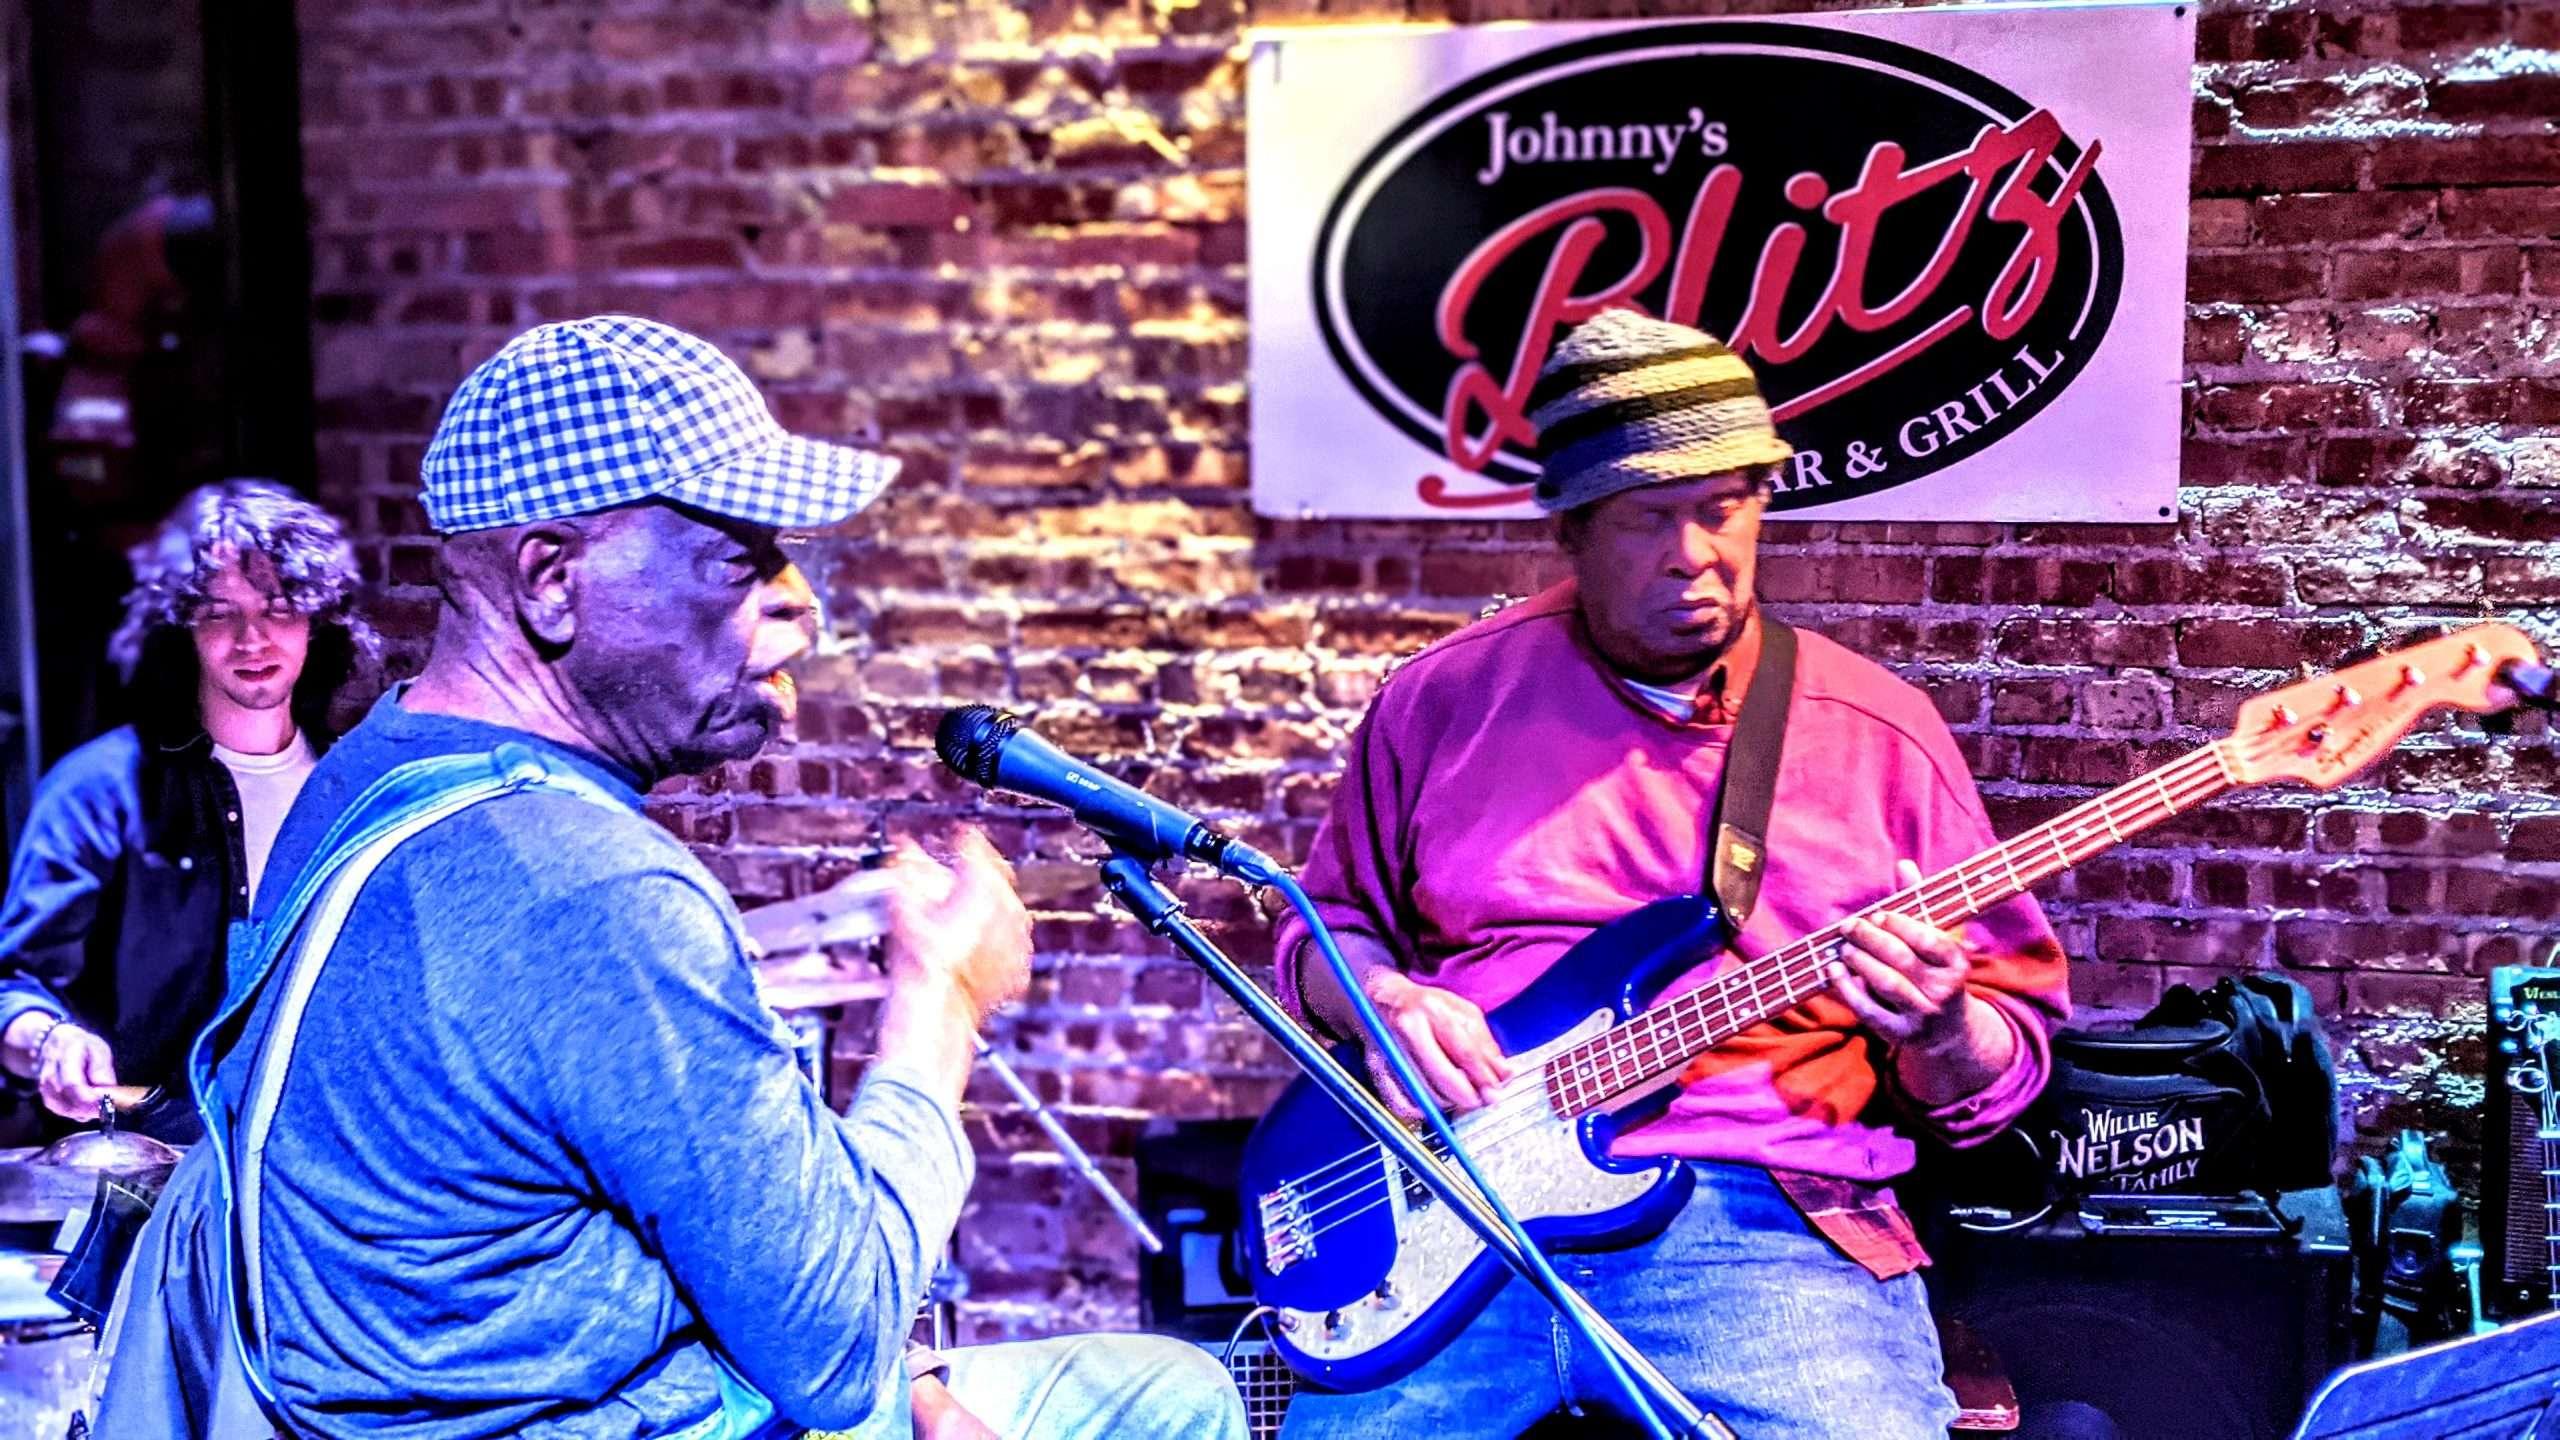 Brian's Open Mic Experiences At Johnny's Blitz Bar & Grill 16